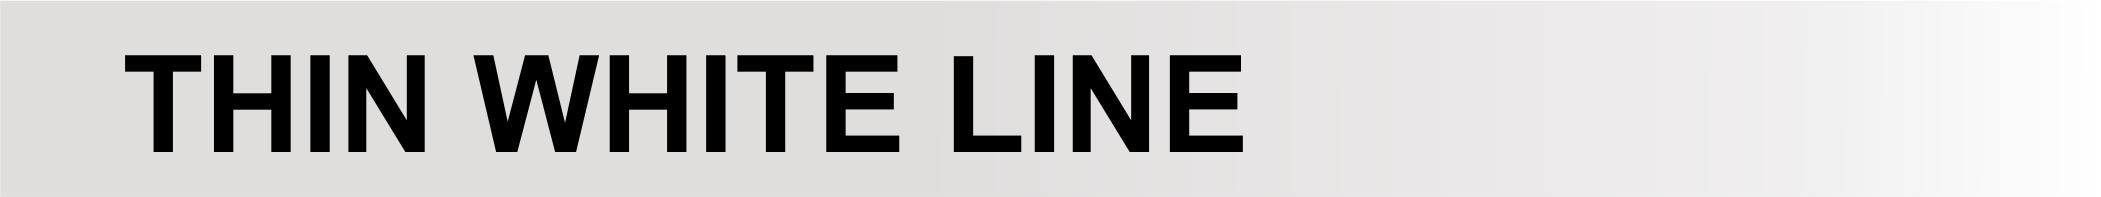 thin-white-line-.jpg